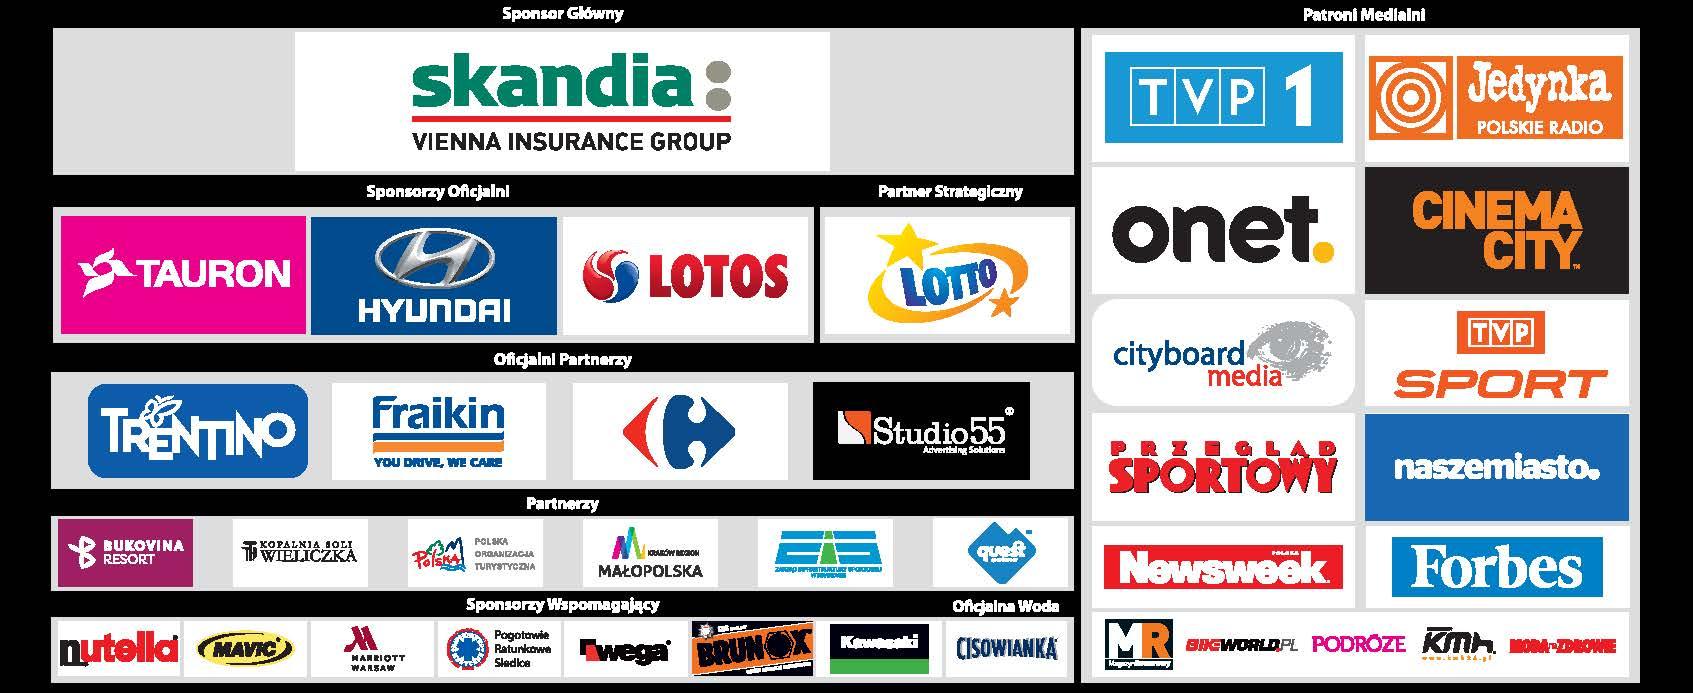 TourDePologne_pasek sponsorski_215Tdp.indd